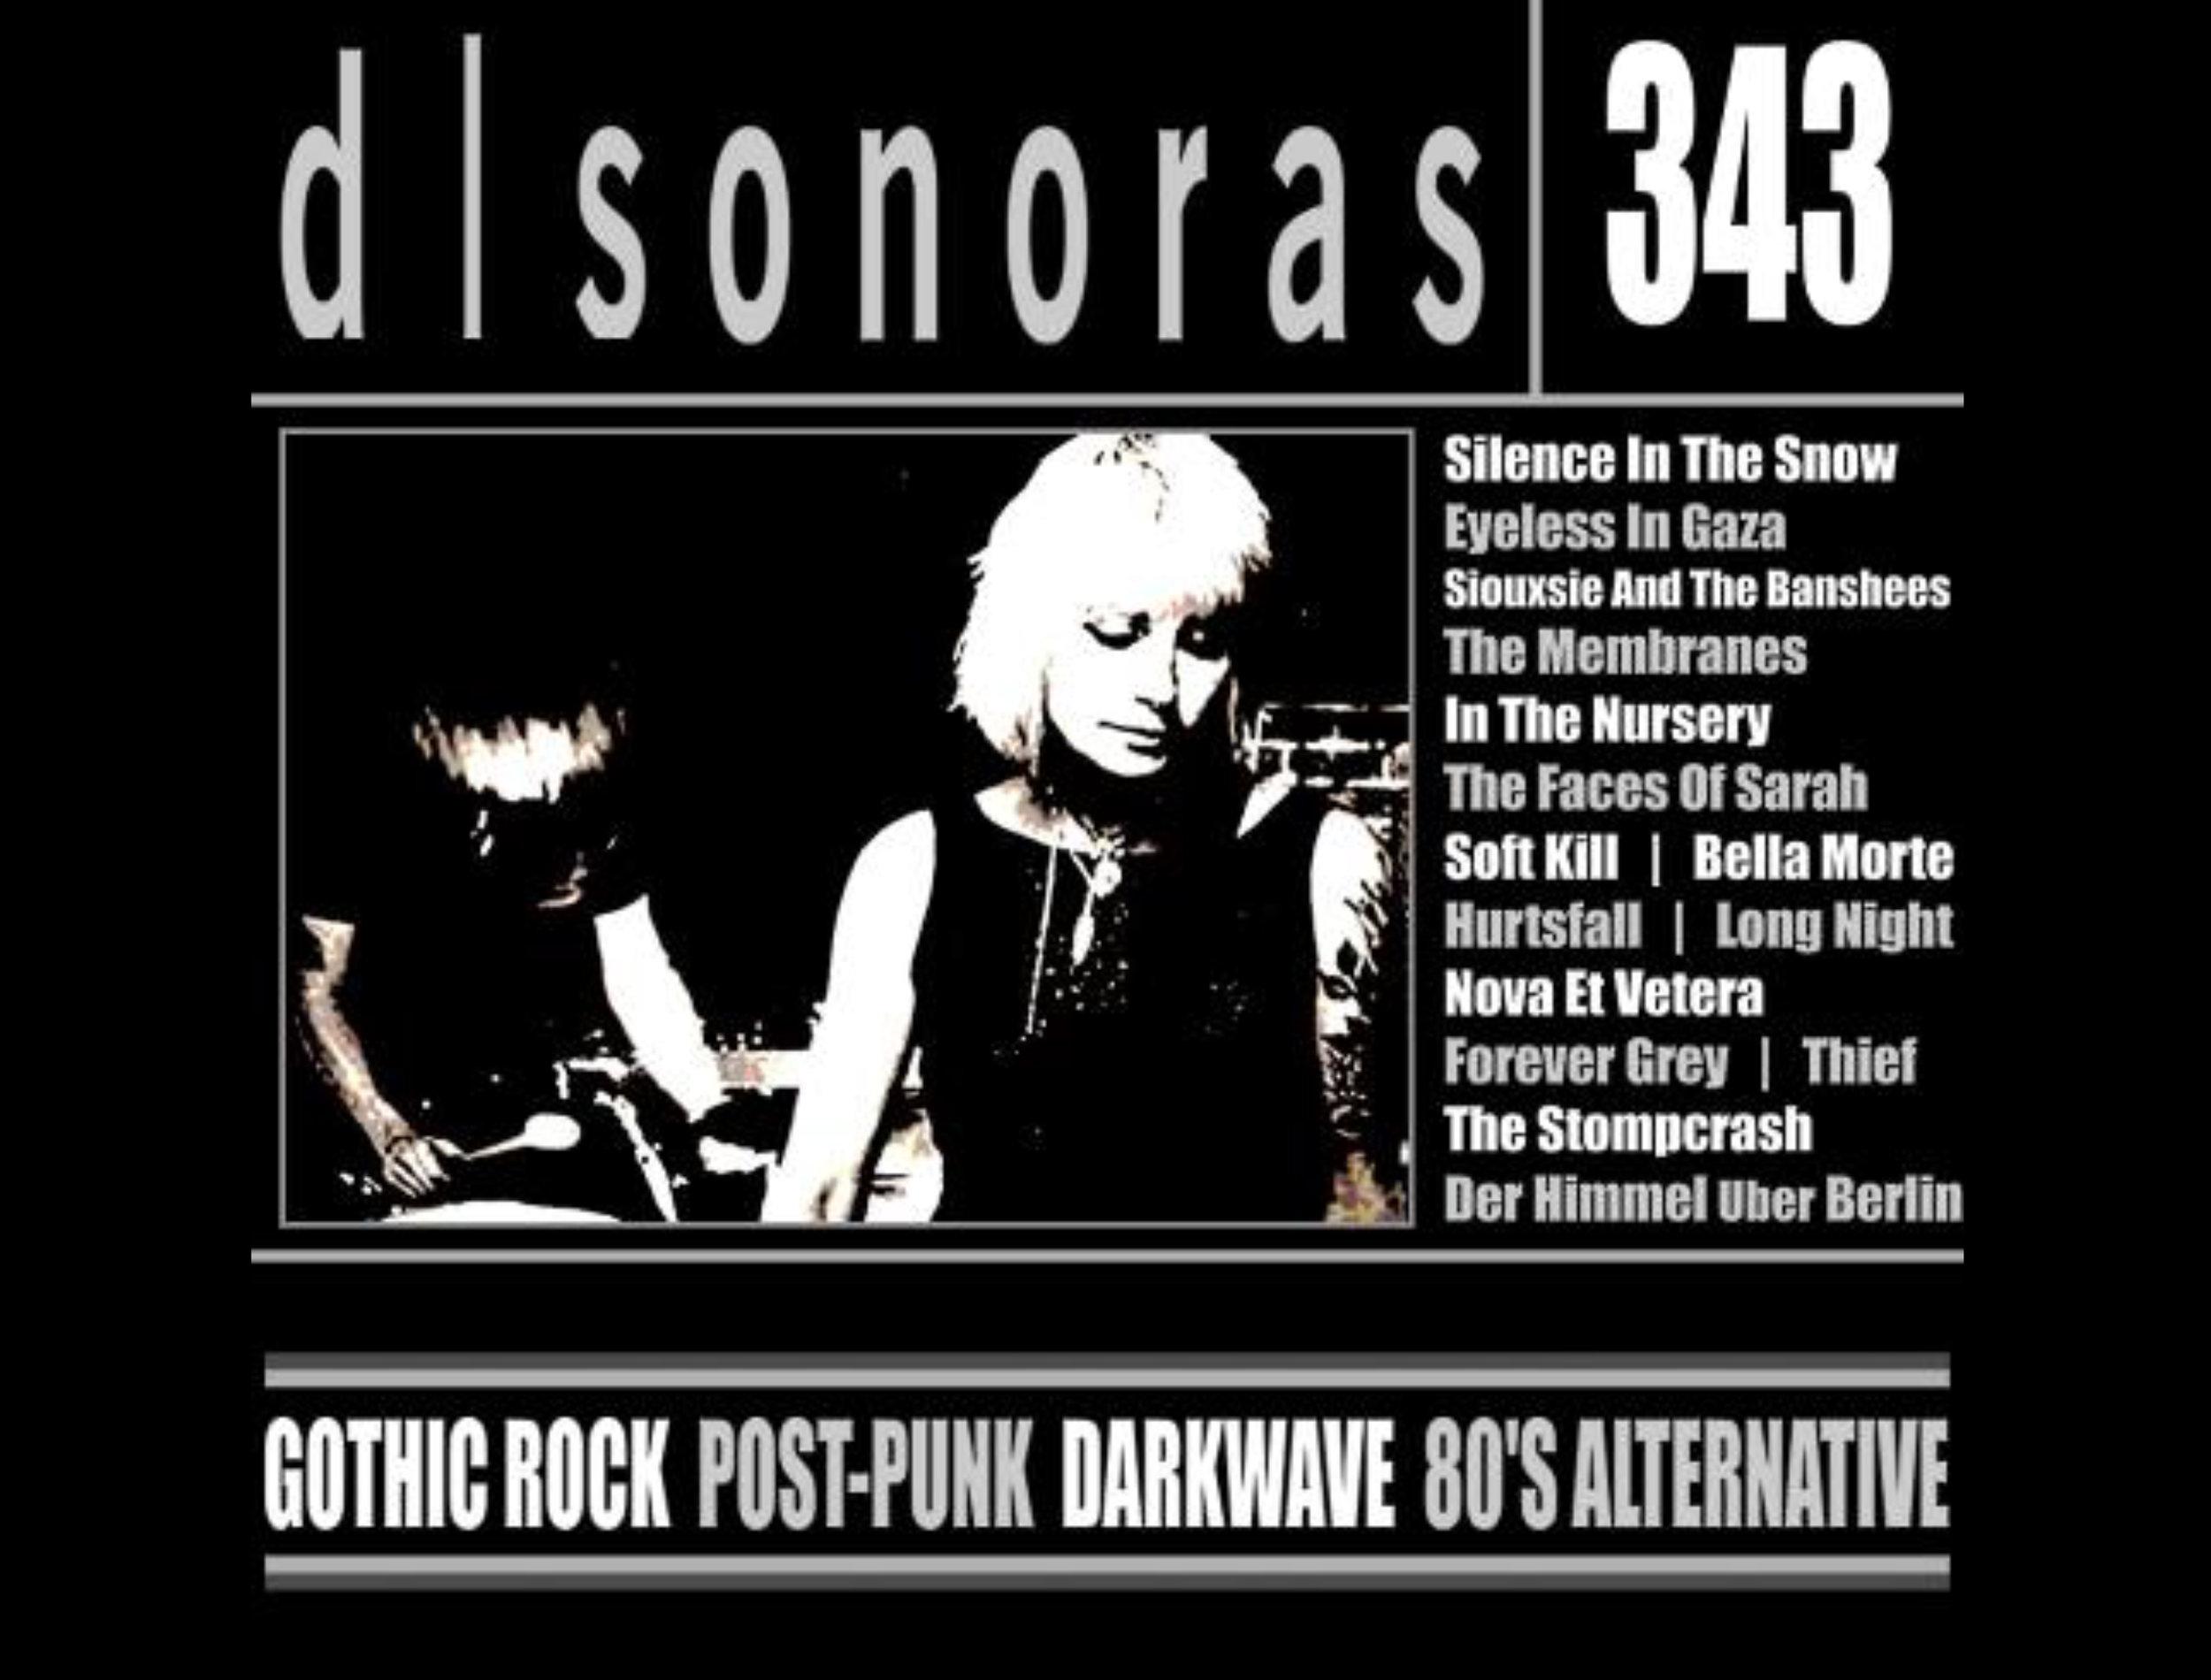 SITS_dl sonoras 343.jpg